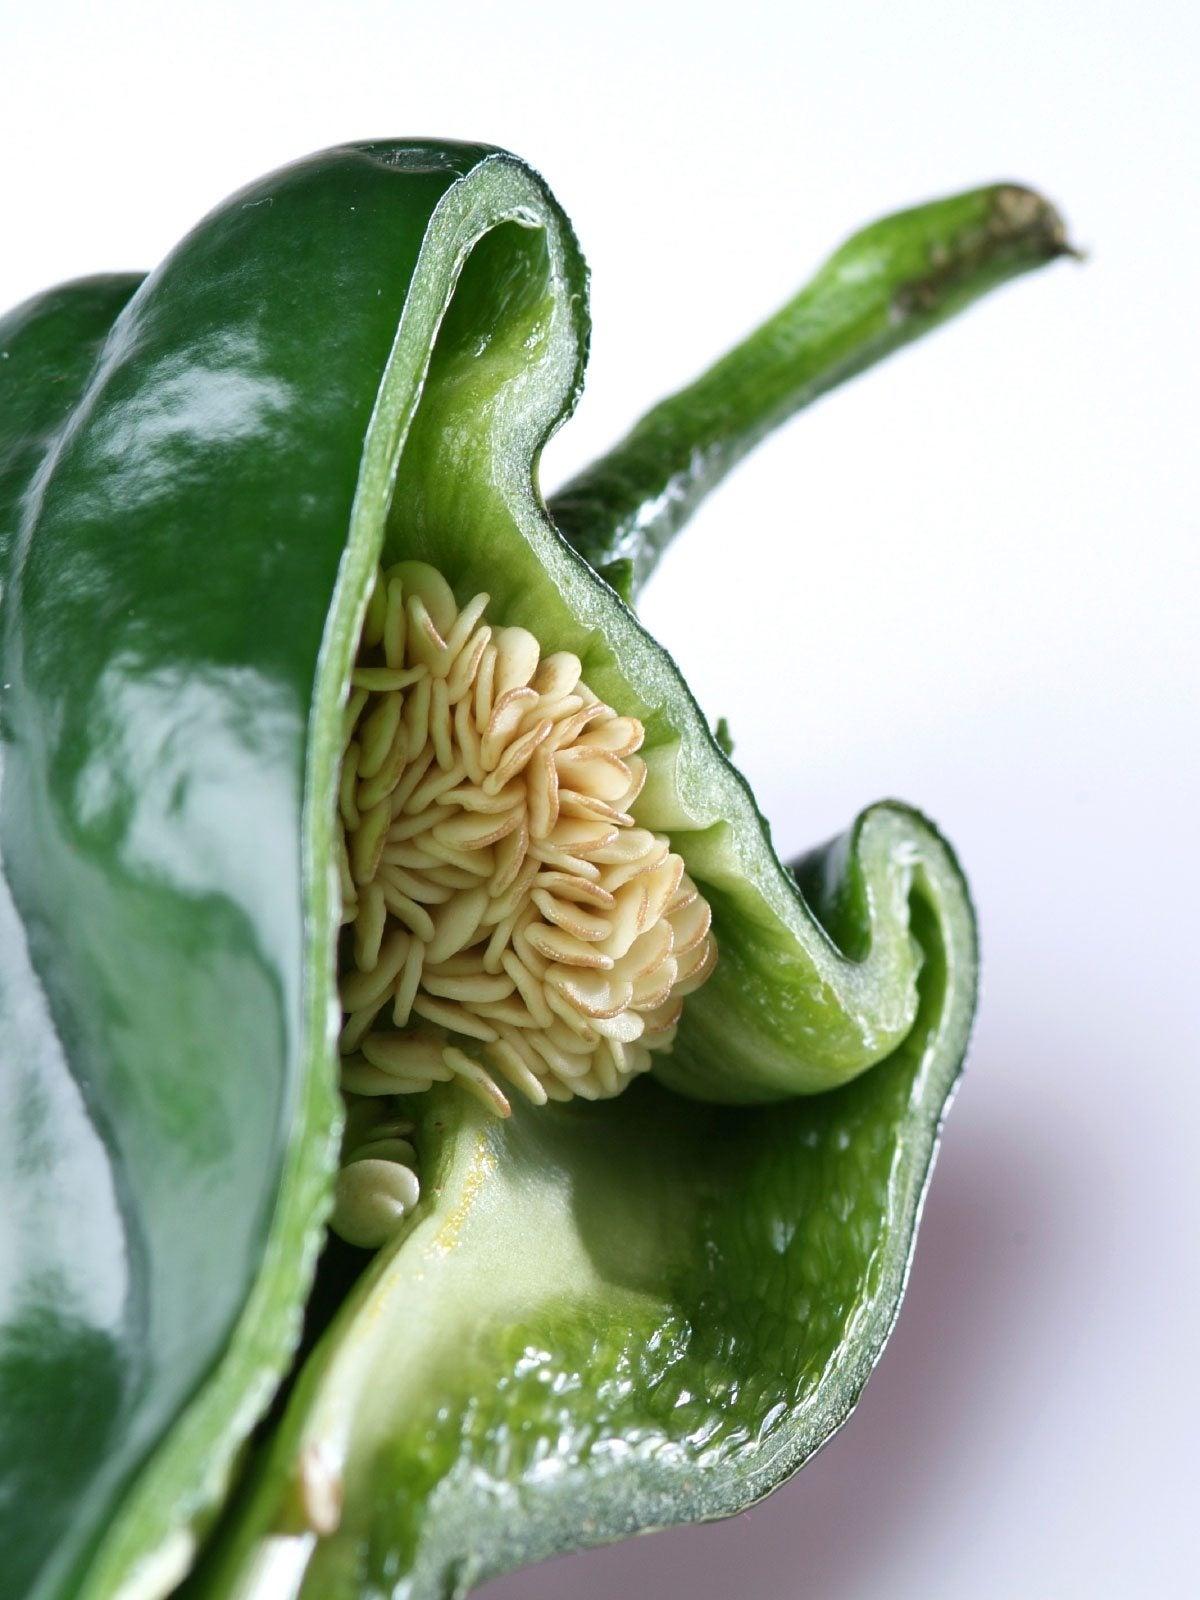 Pepper Seeds Information